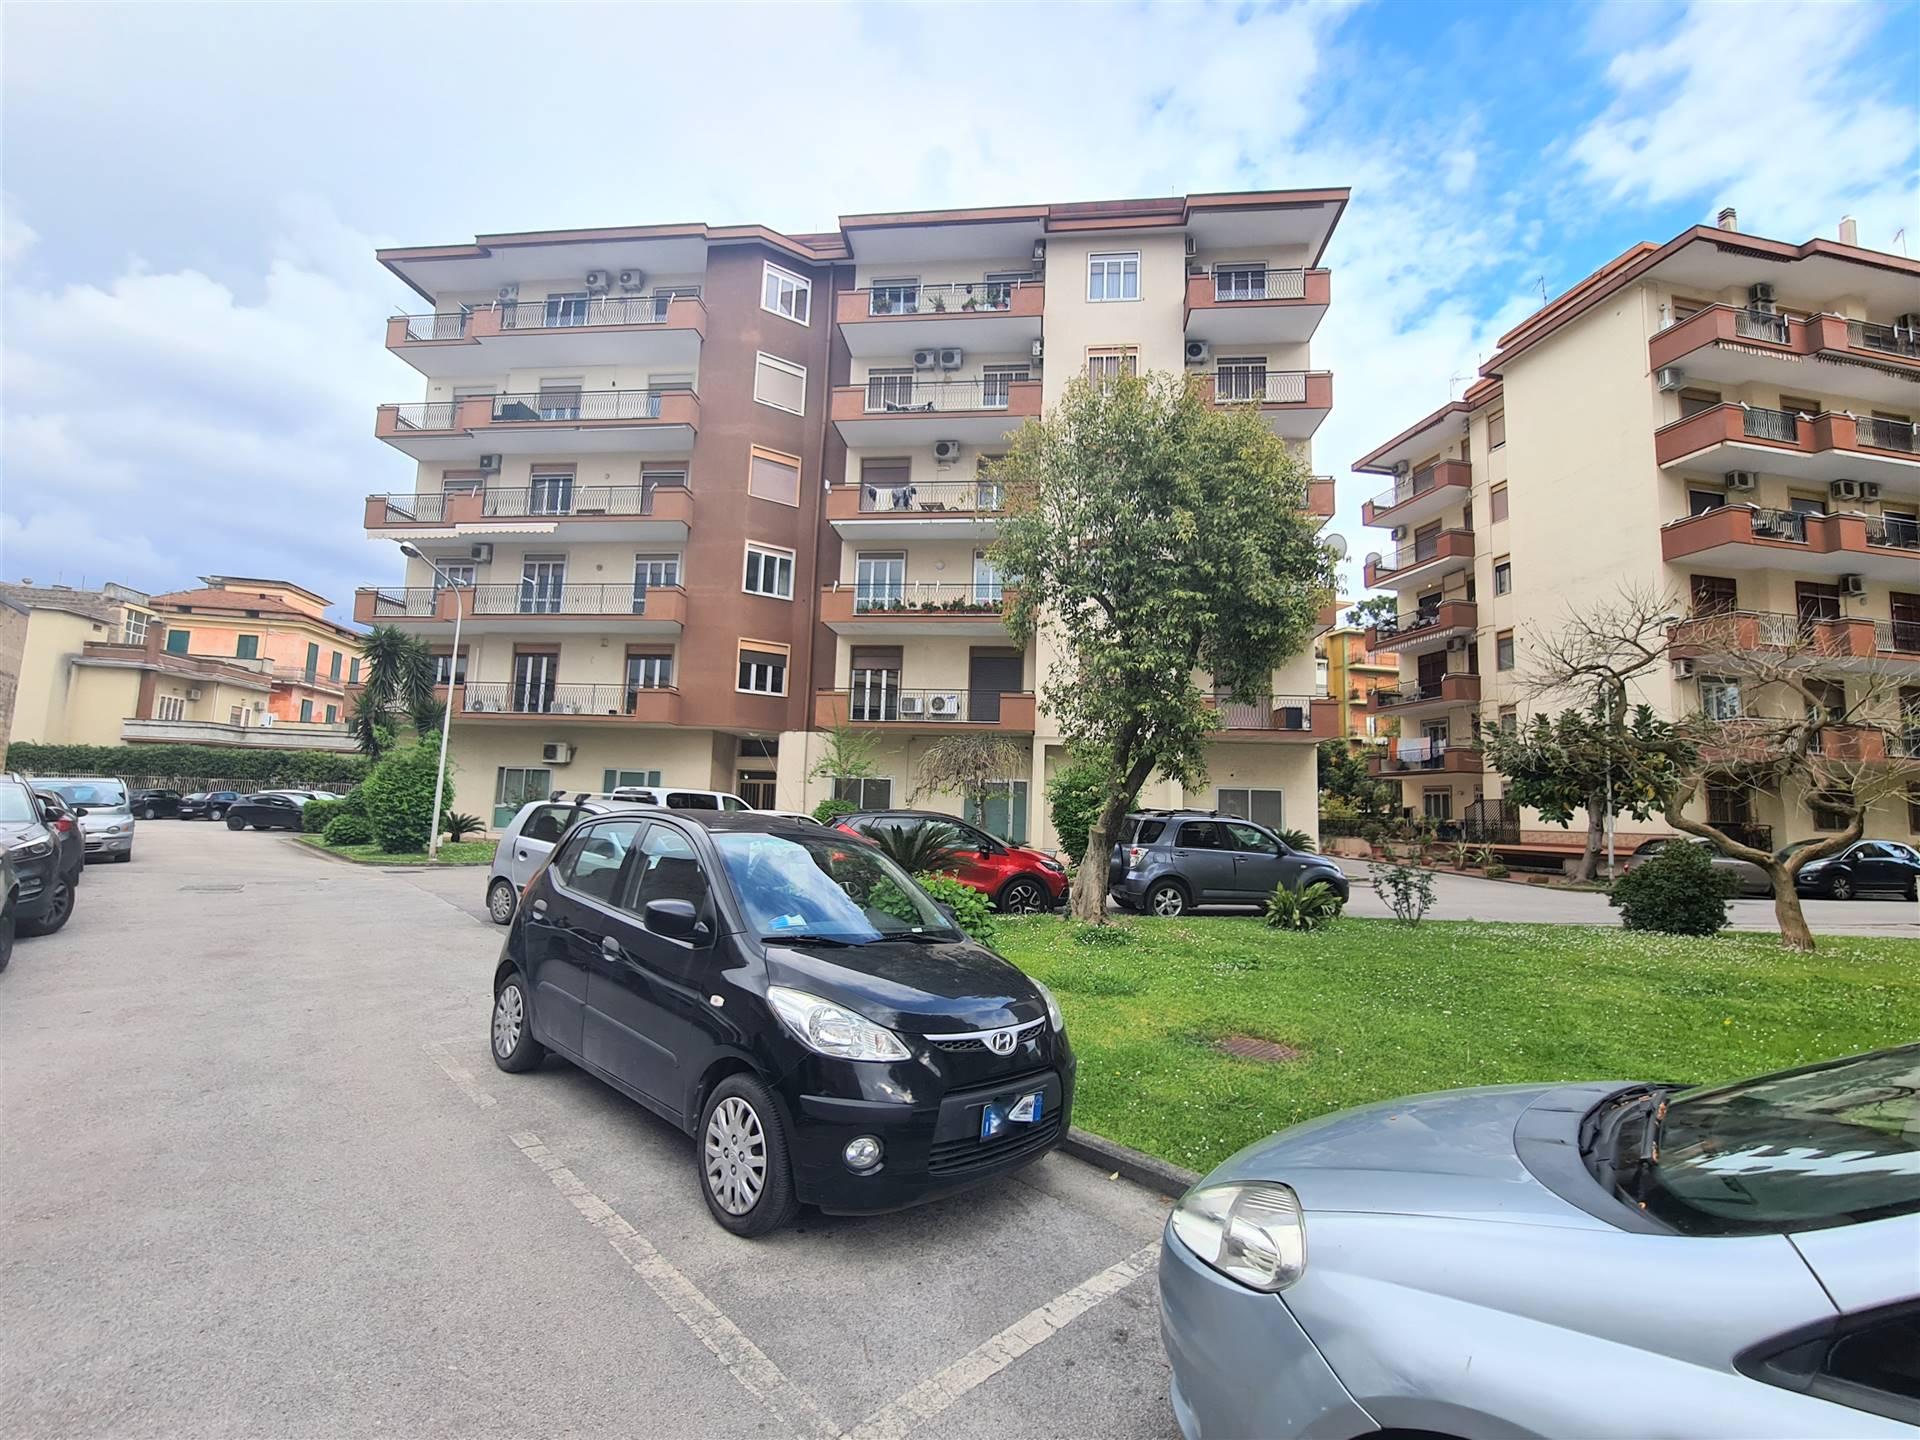 UV123G-Ufficio-SANTA-MARIA-CAPUA-VETERE-Via-Togliatti-